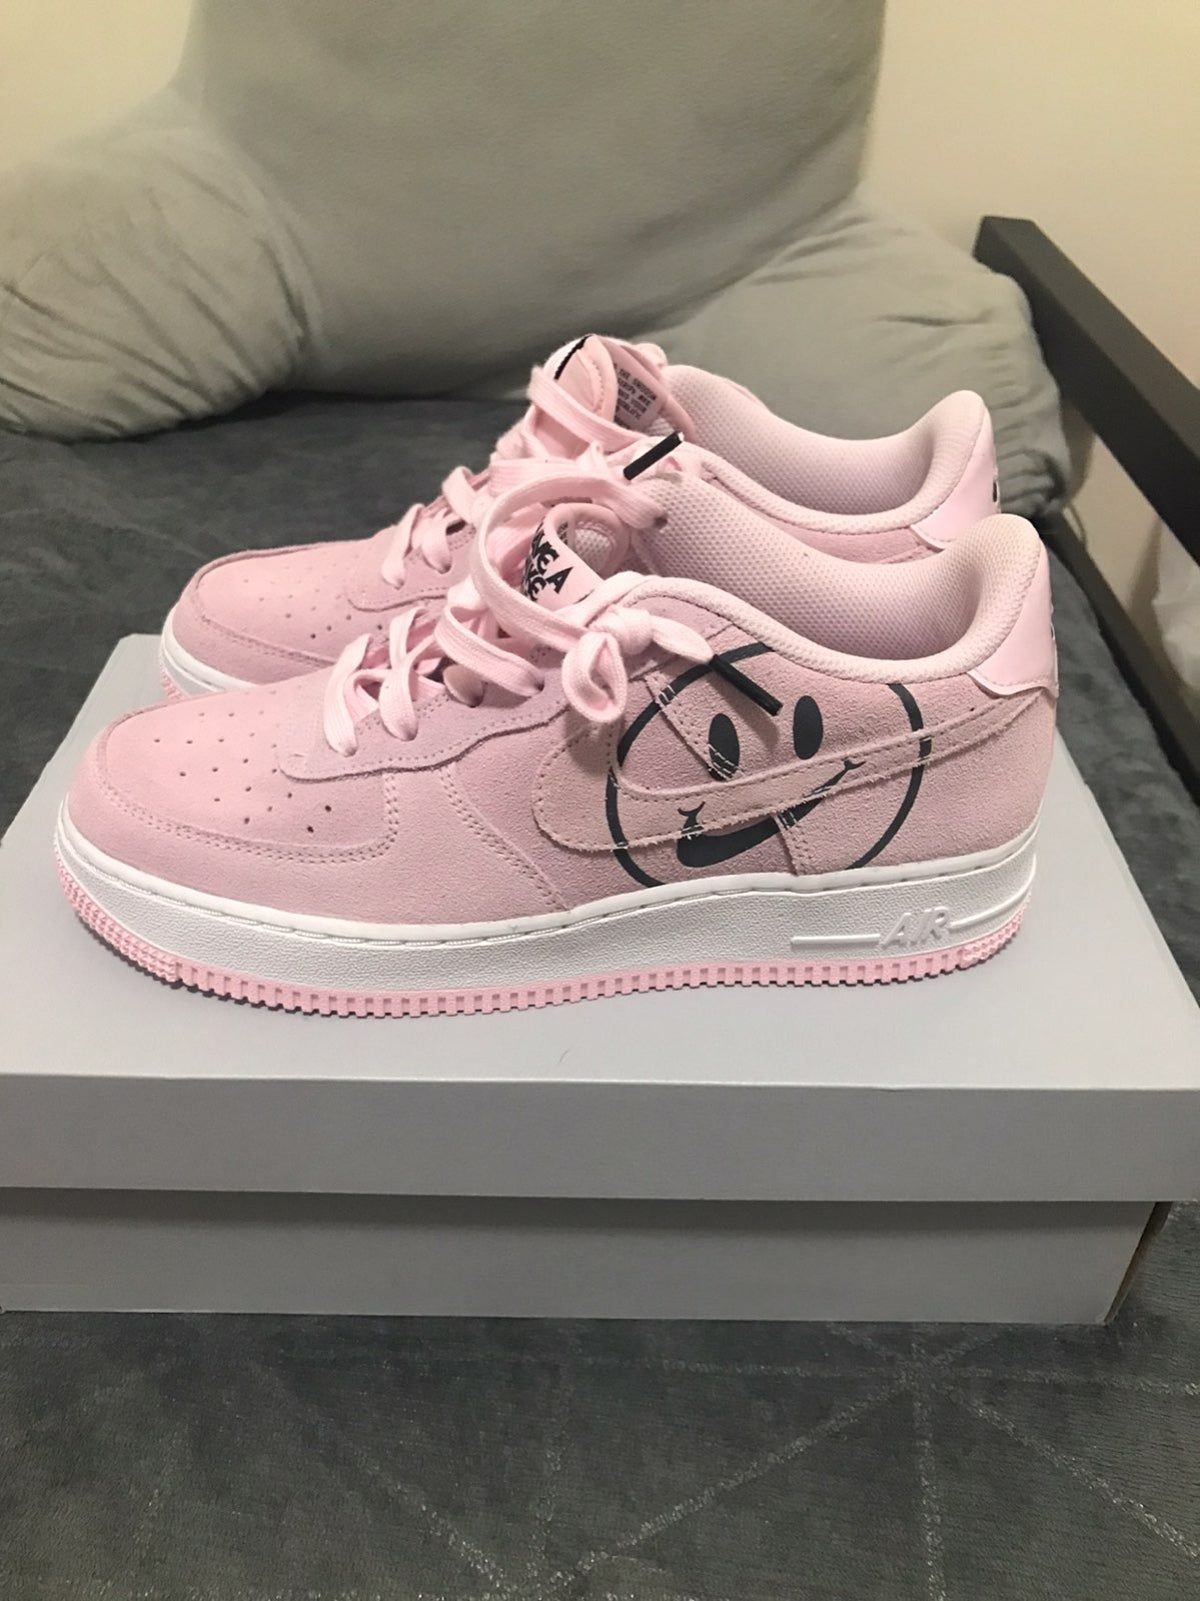 Nike Air Force 1 in 2020 | Nike, Trendy shoes, Nike air force